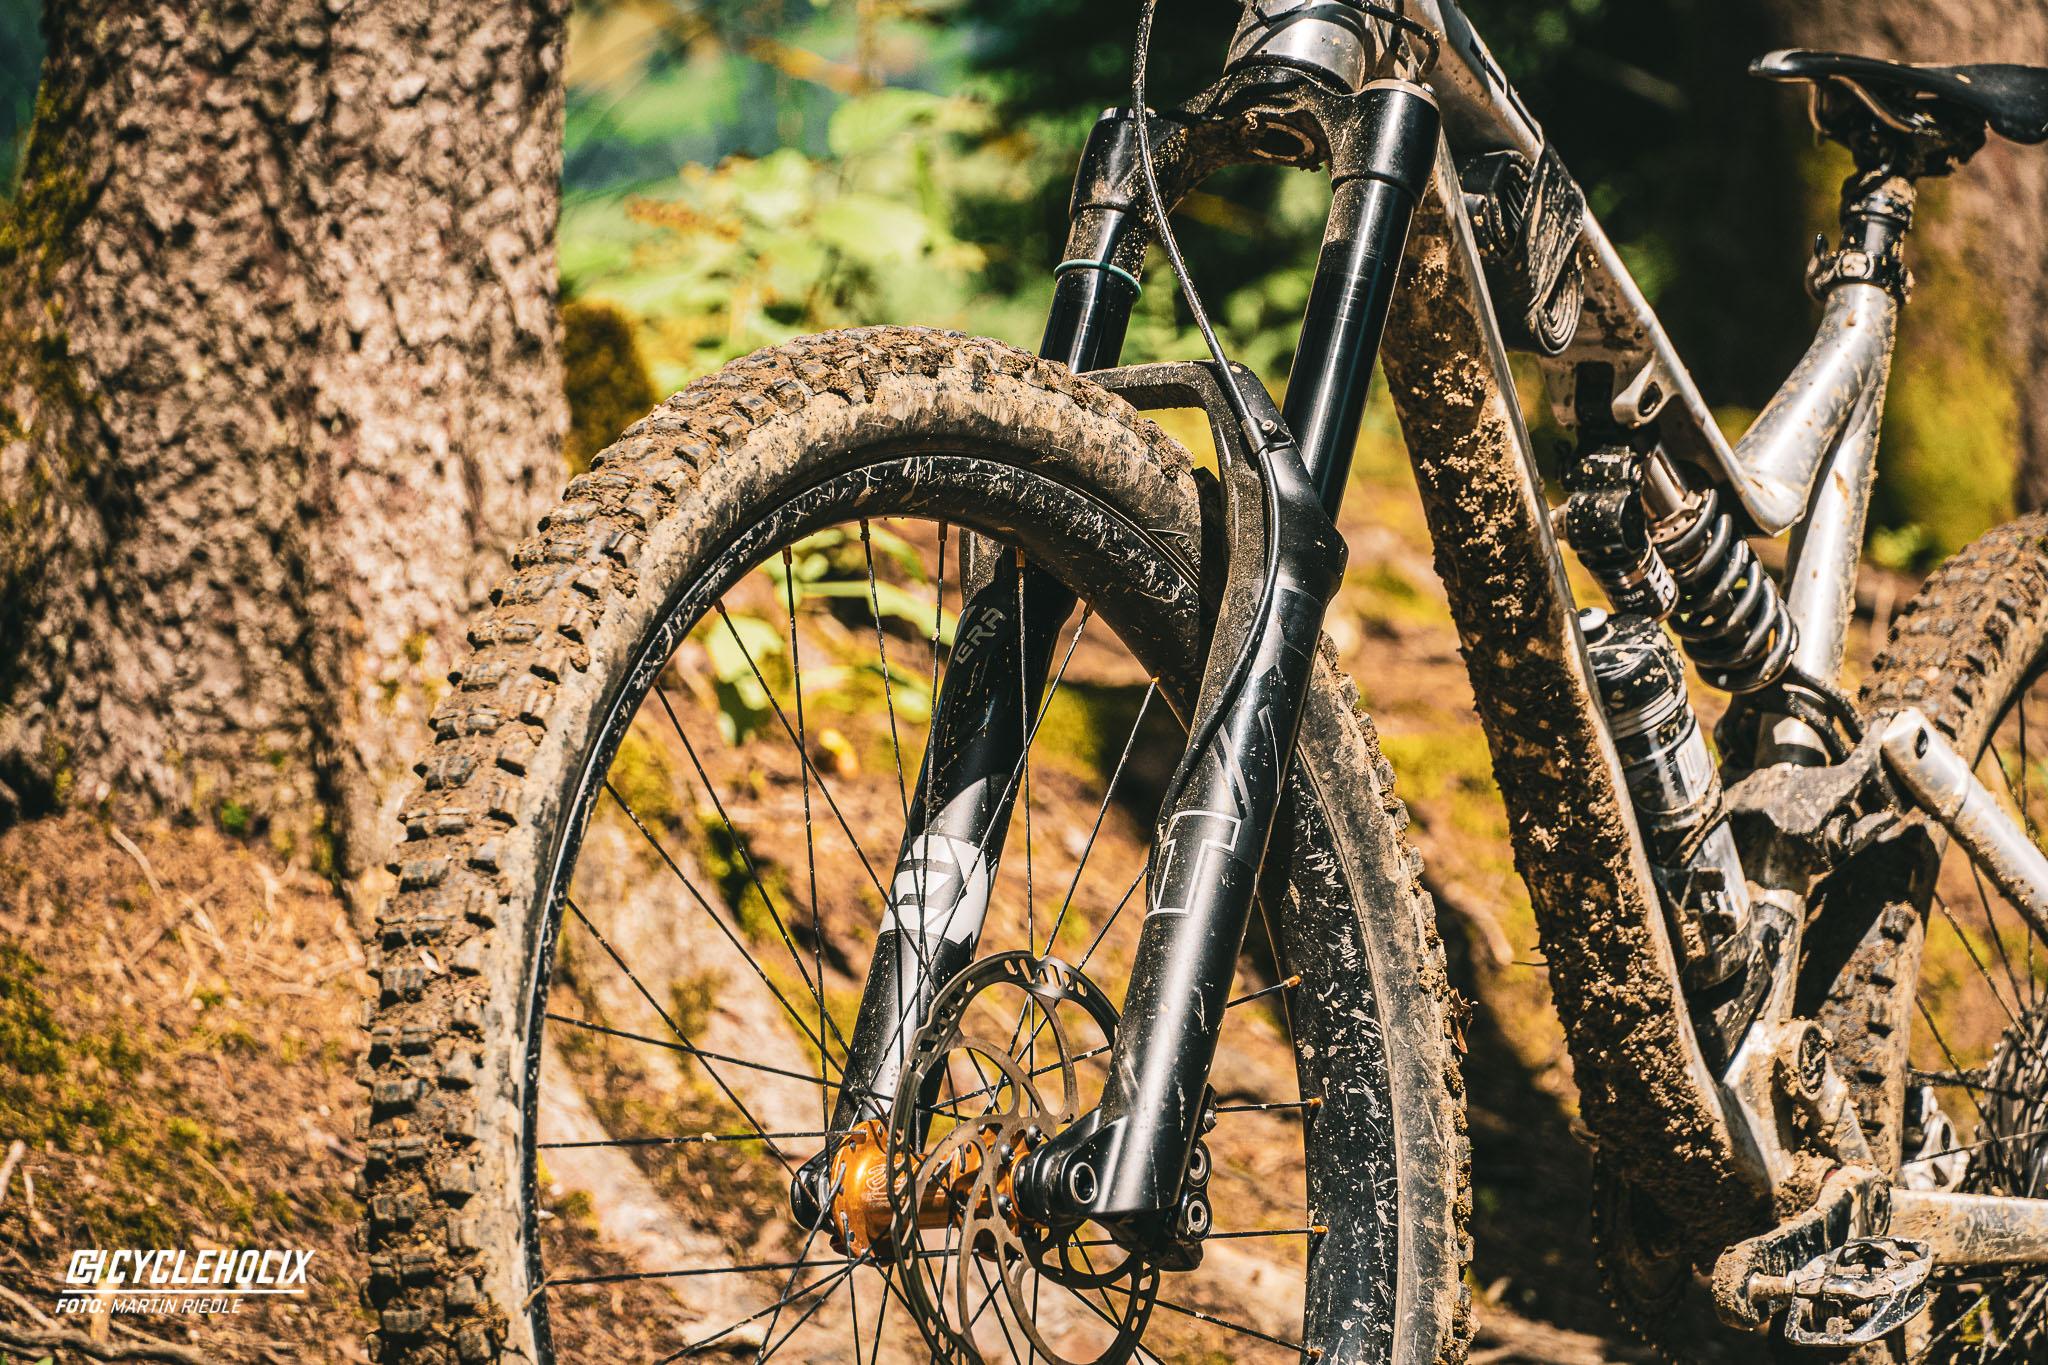 2021 EXT Storia Era 29 Cycleholix